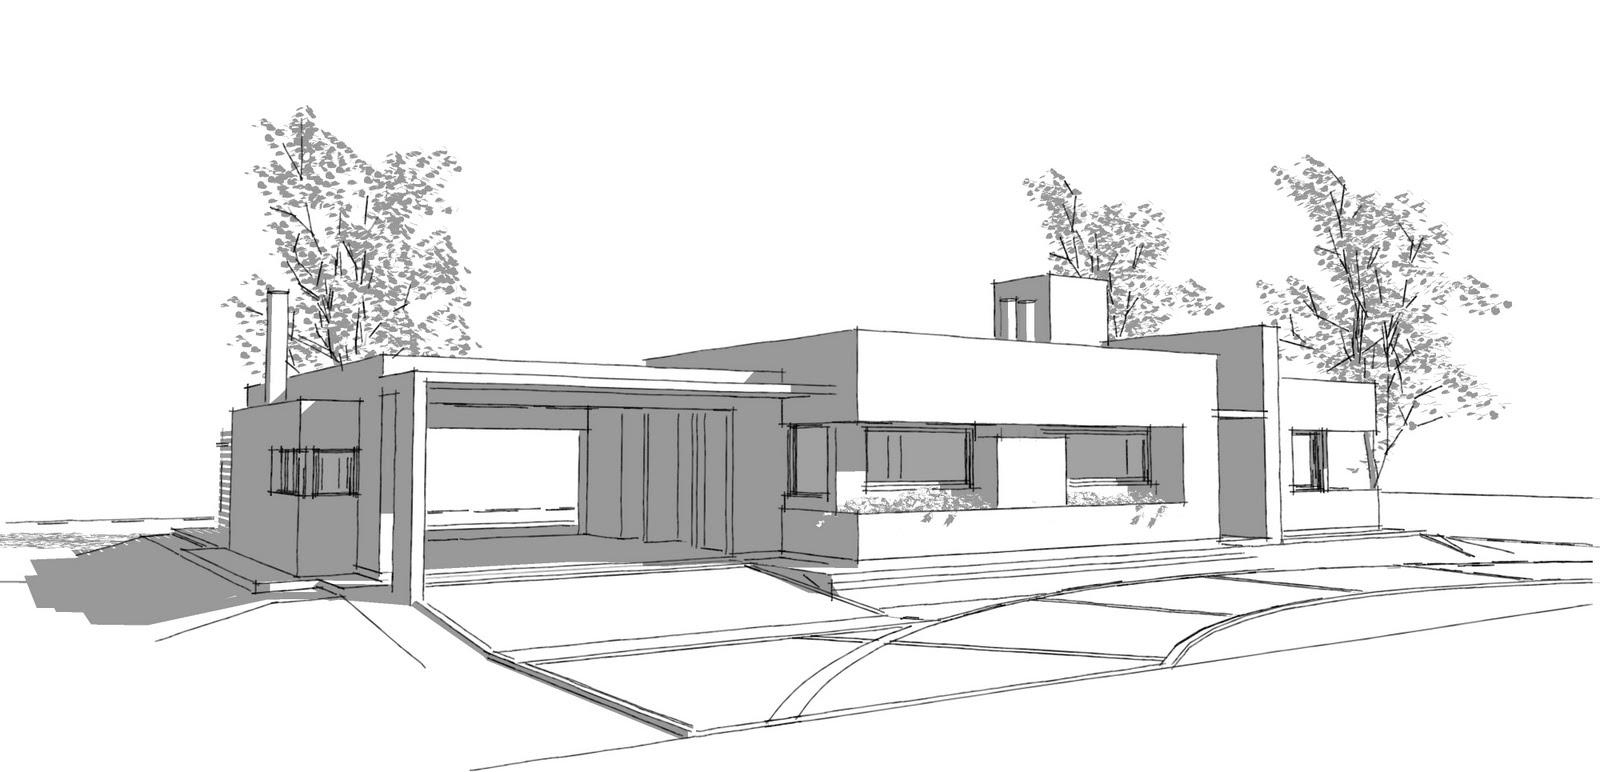 C s taller de arquitectura vivienda bm - Arquitectos en cordoba ...